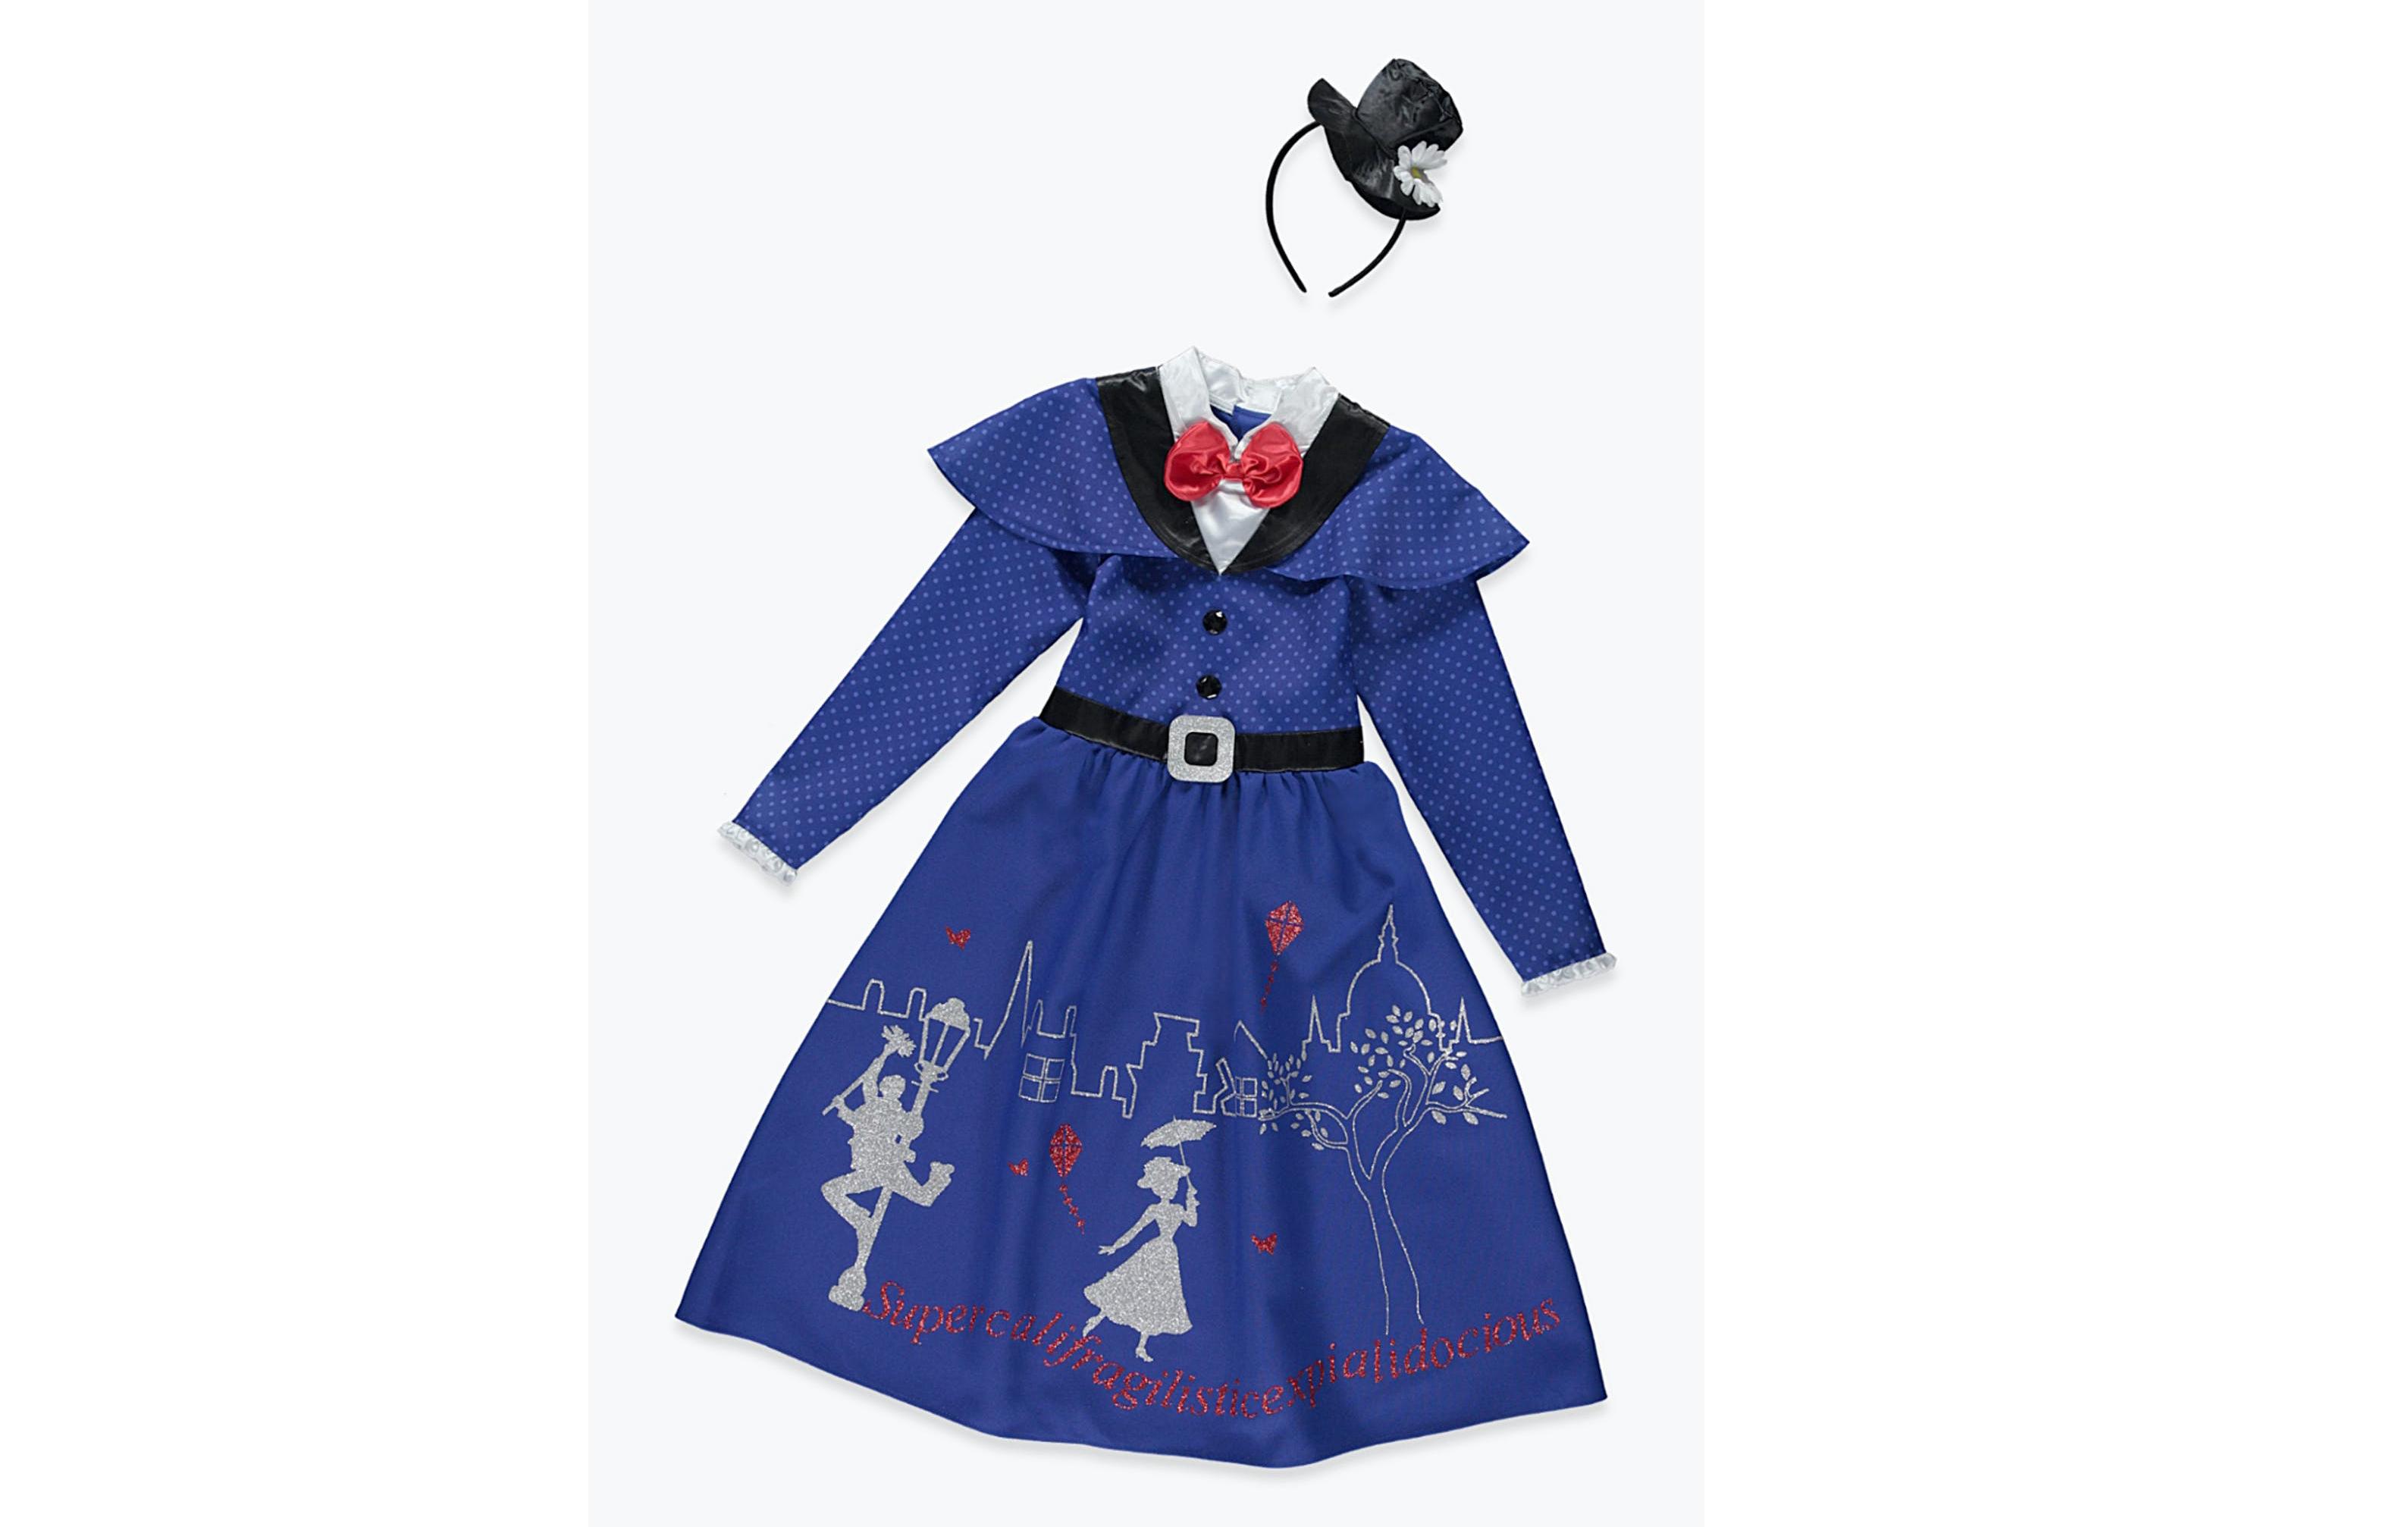 Costume d'Halloween Mary Poppins Matalan pour enfants